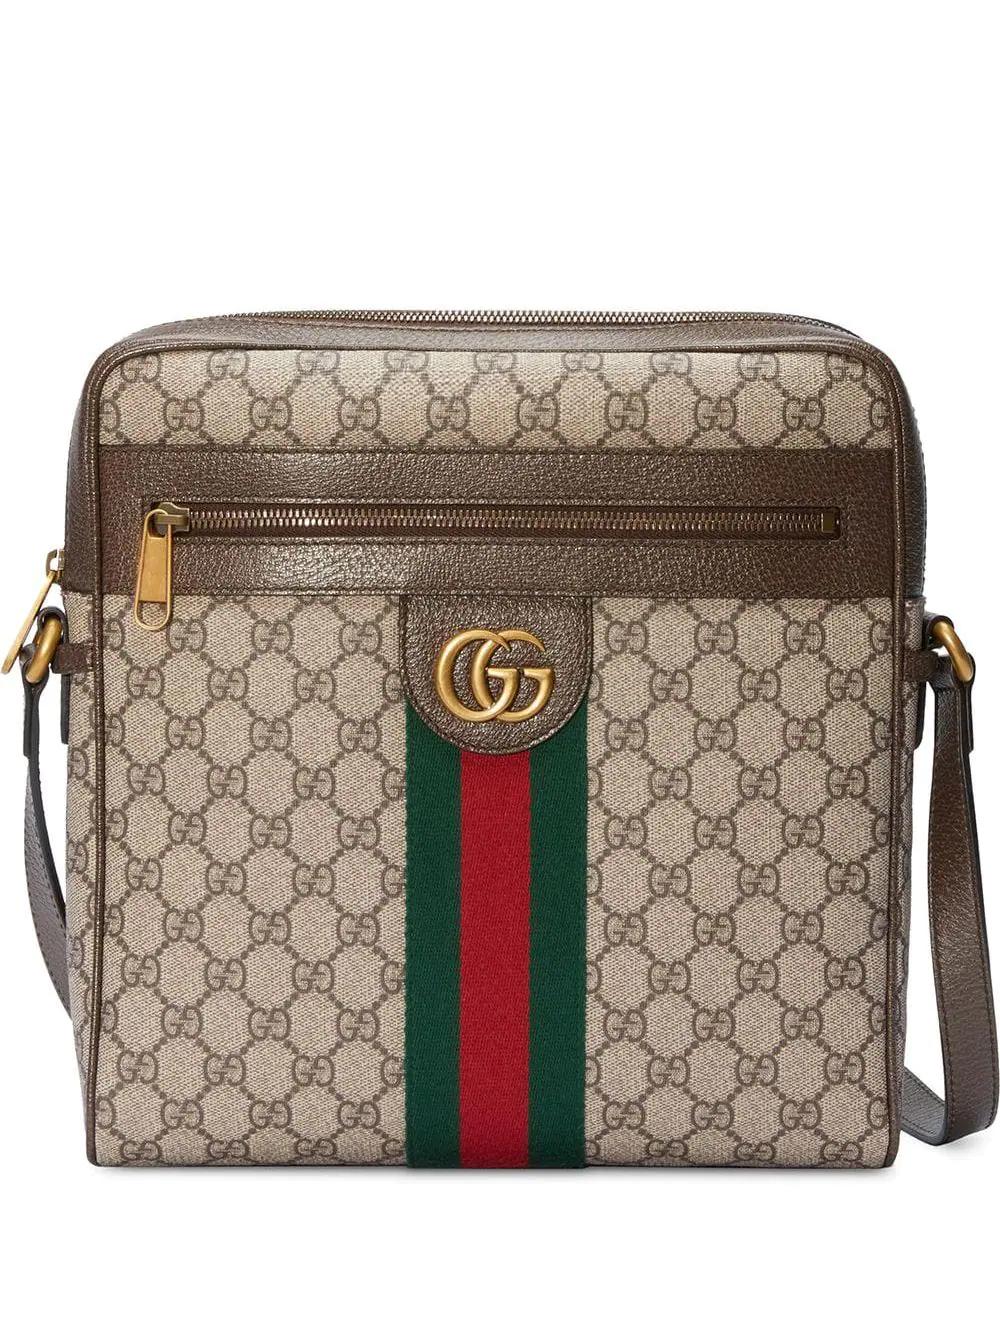 GUCCI | сумка через плечо 'Ophidia GG' | Clouty